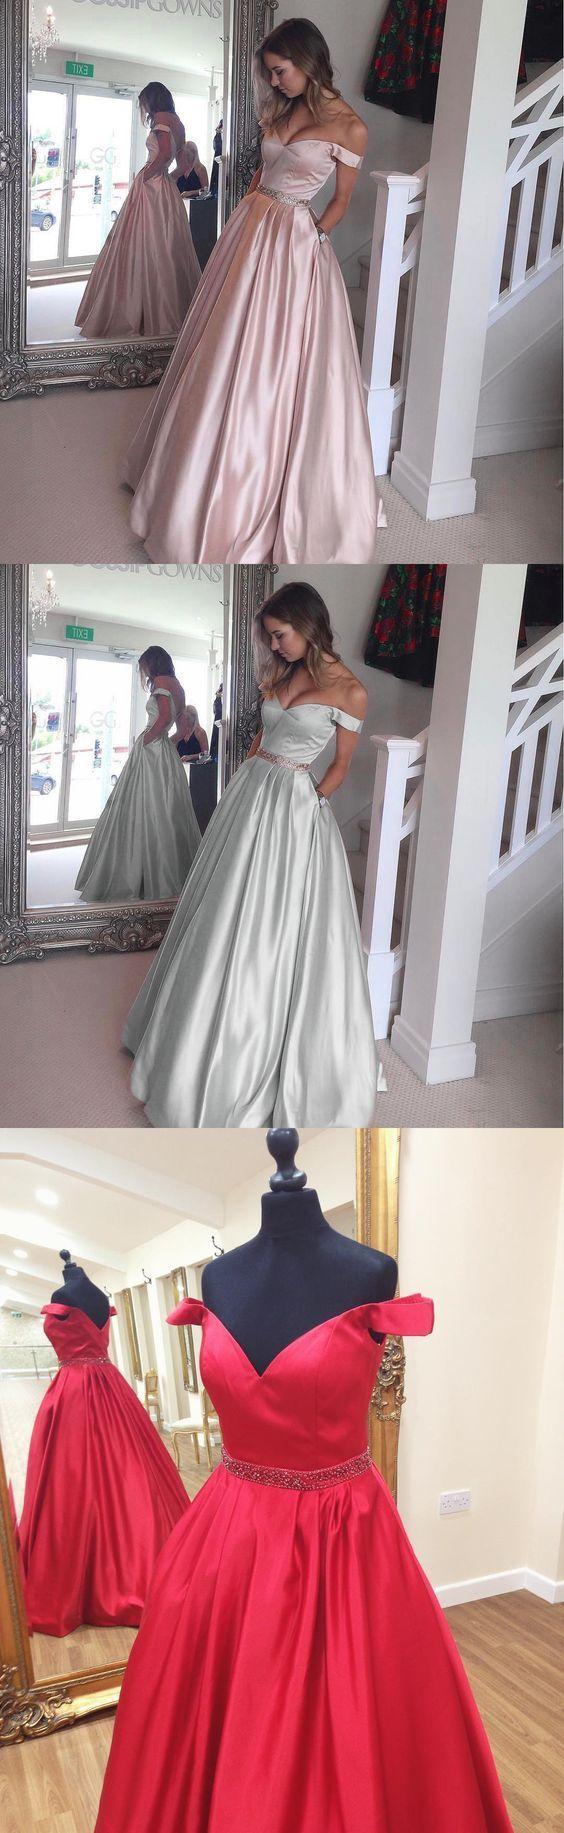 Sleeveless prom dress sexy prom dressesball gown evening dress